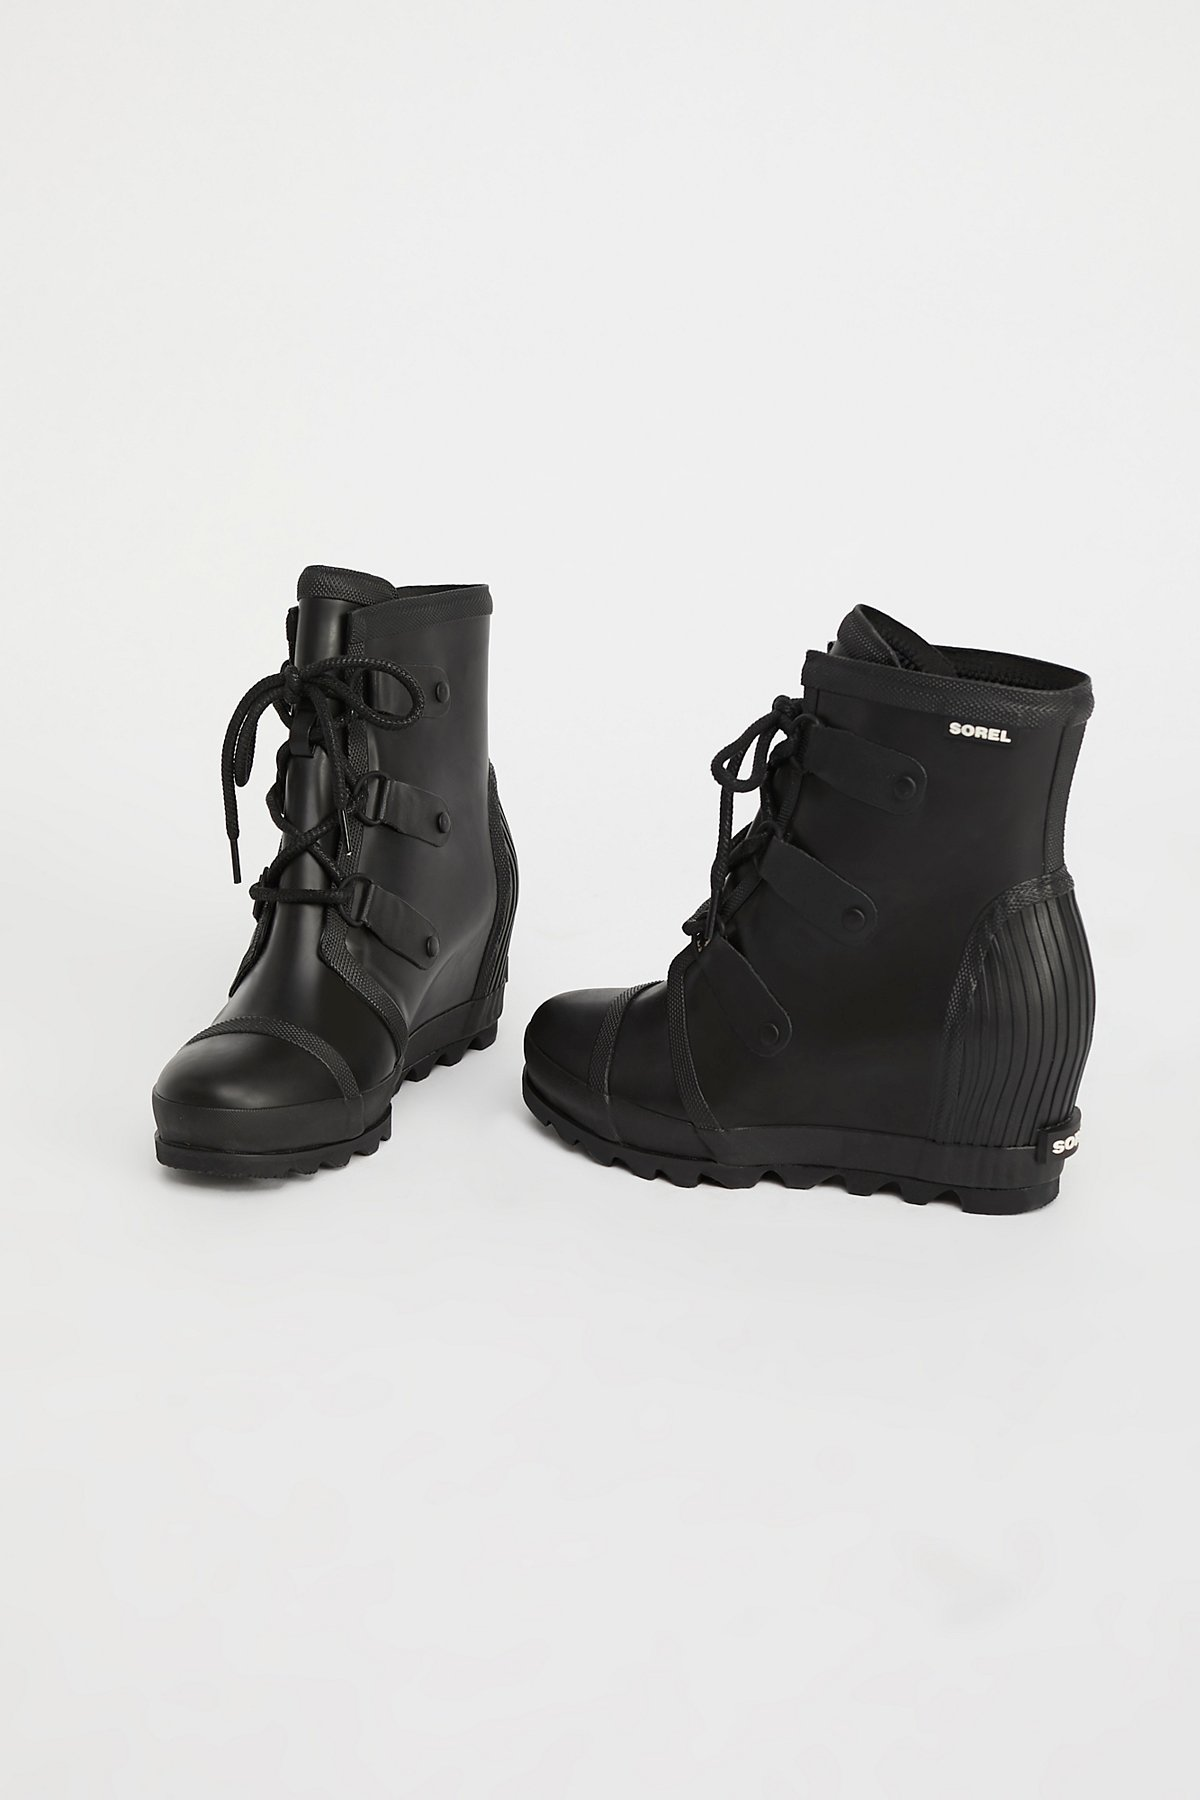 Joan坡跟靴